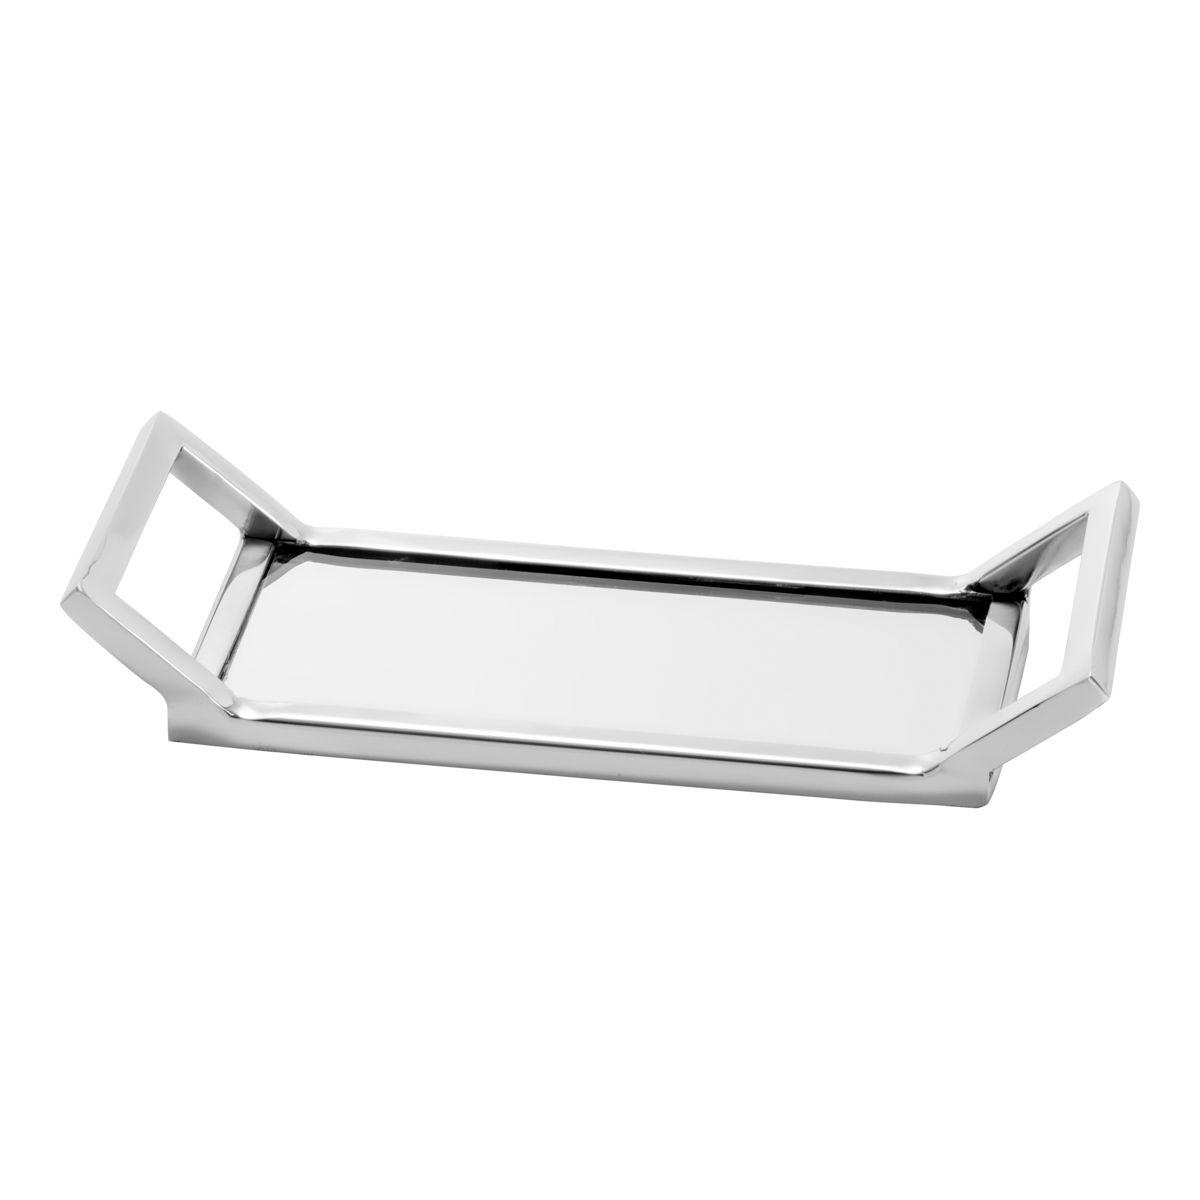 Bandeja De Aço Inox C/Espelho Mirror 27,5x10,5cm